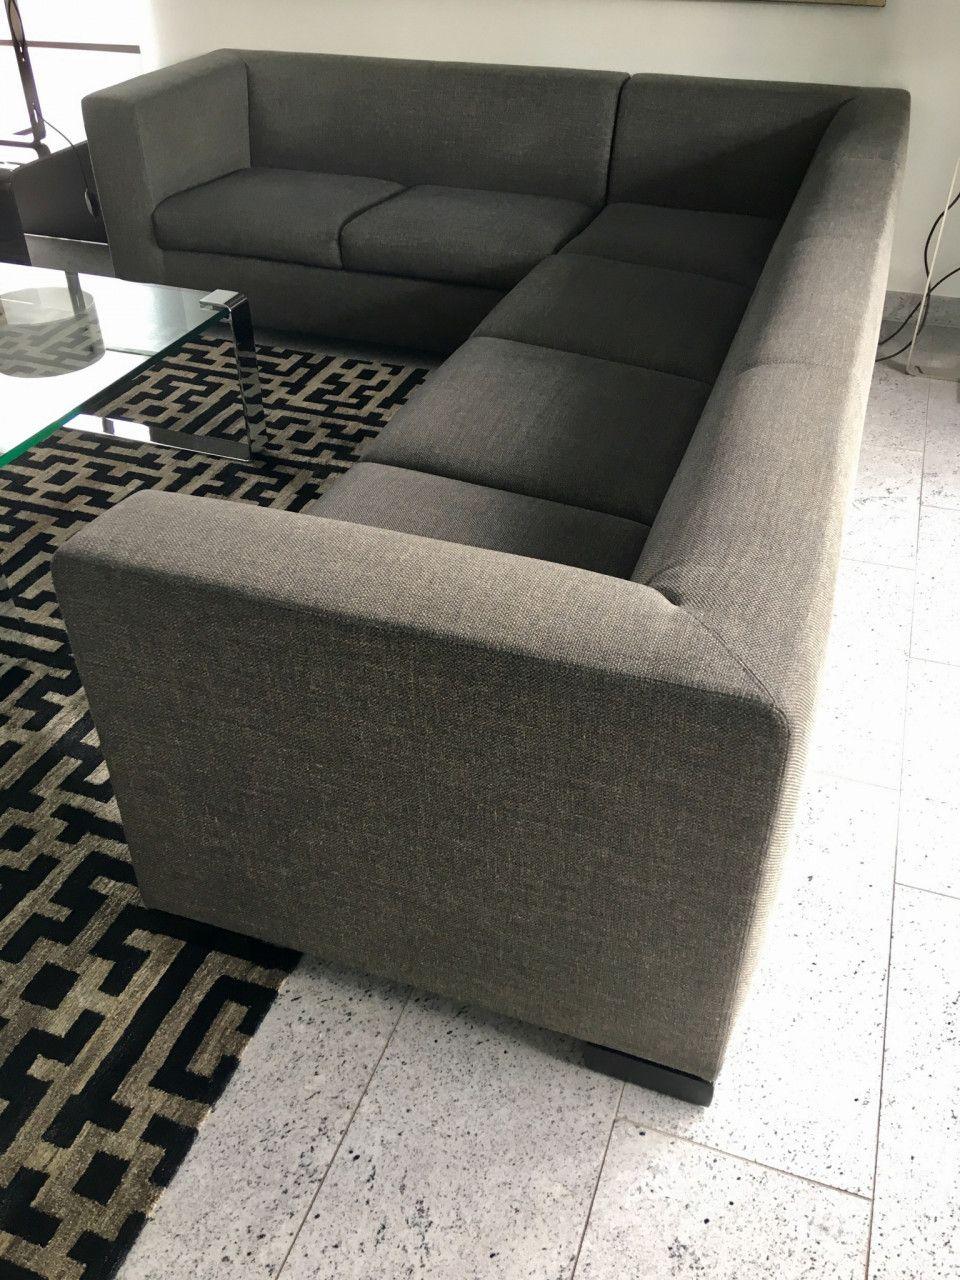 Wittmann Sofa Eckgarnitur In Stoff Grau Gemutliches Sofa Bequeme Sessel Sessel